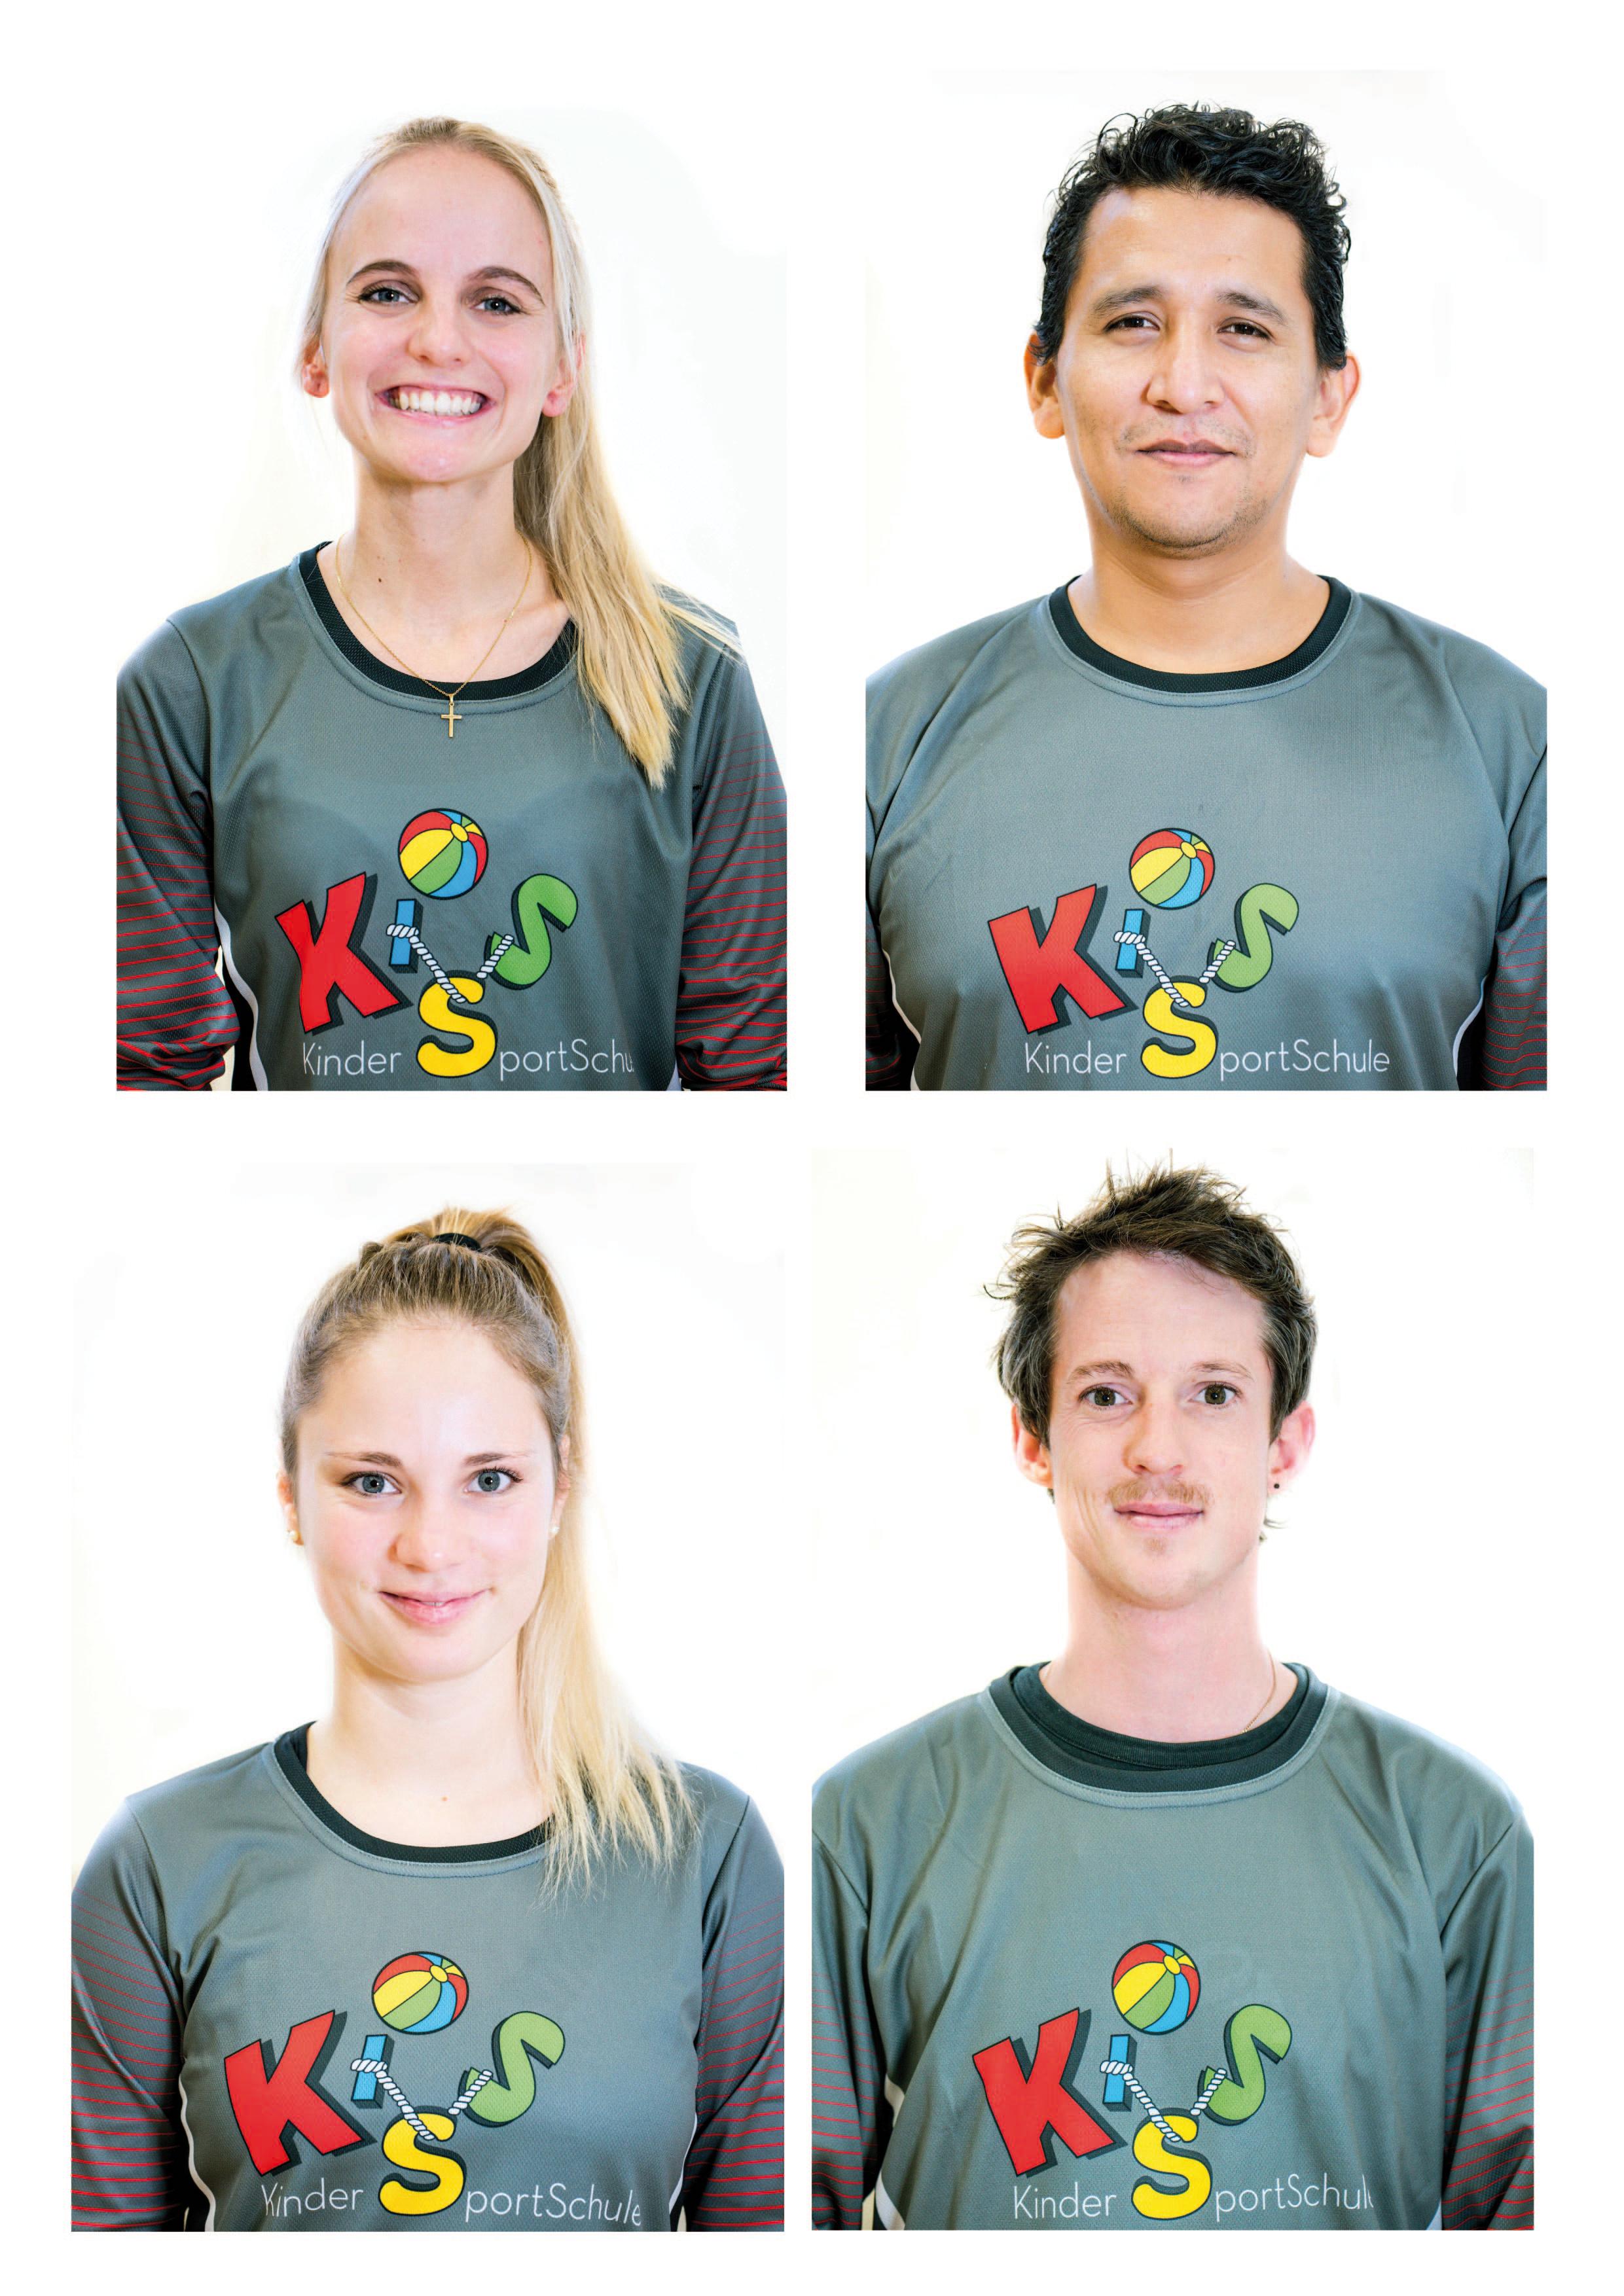 Sportverein MTV Abteilung KISS Team